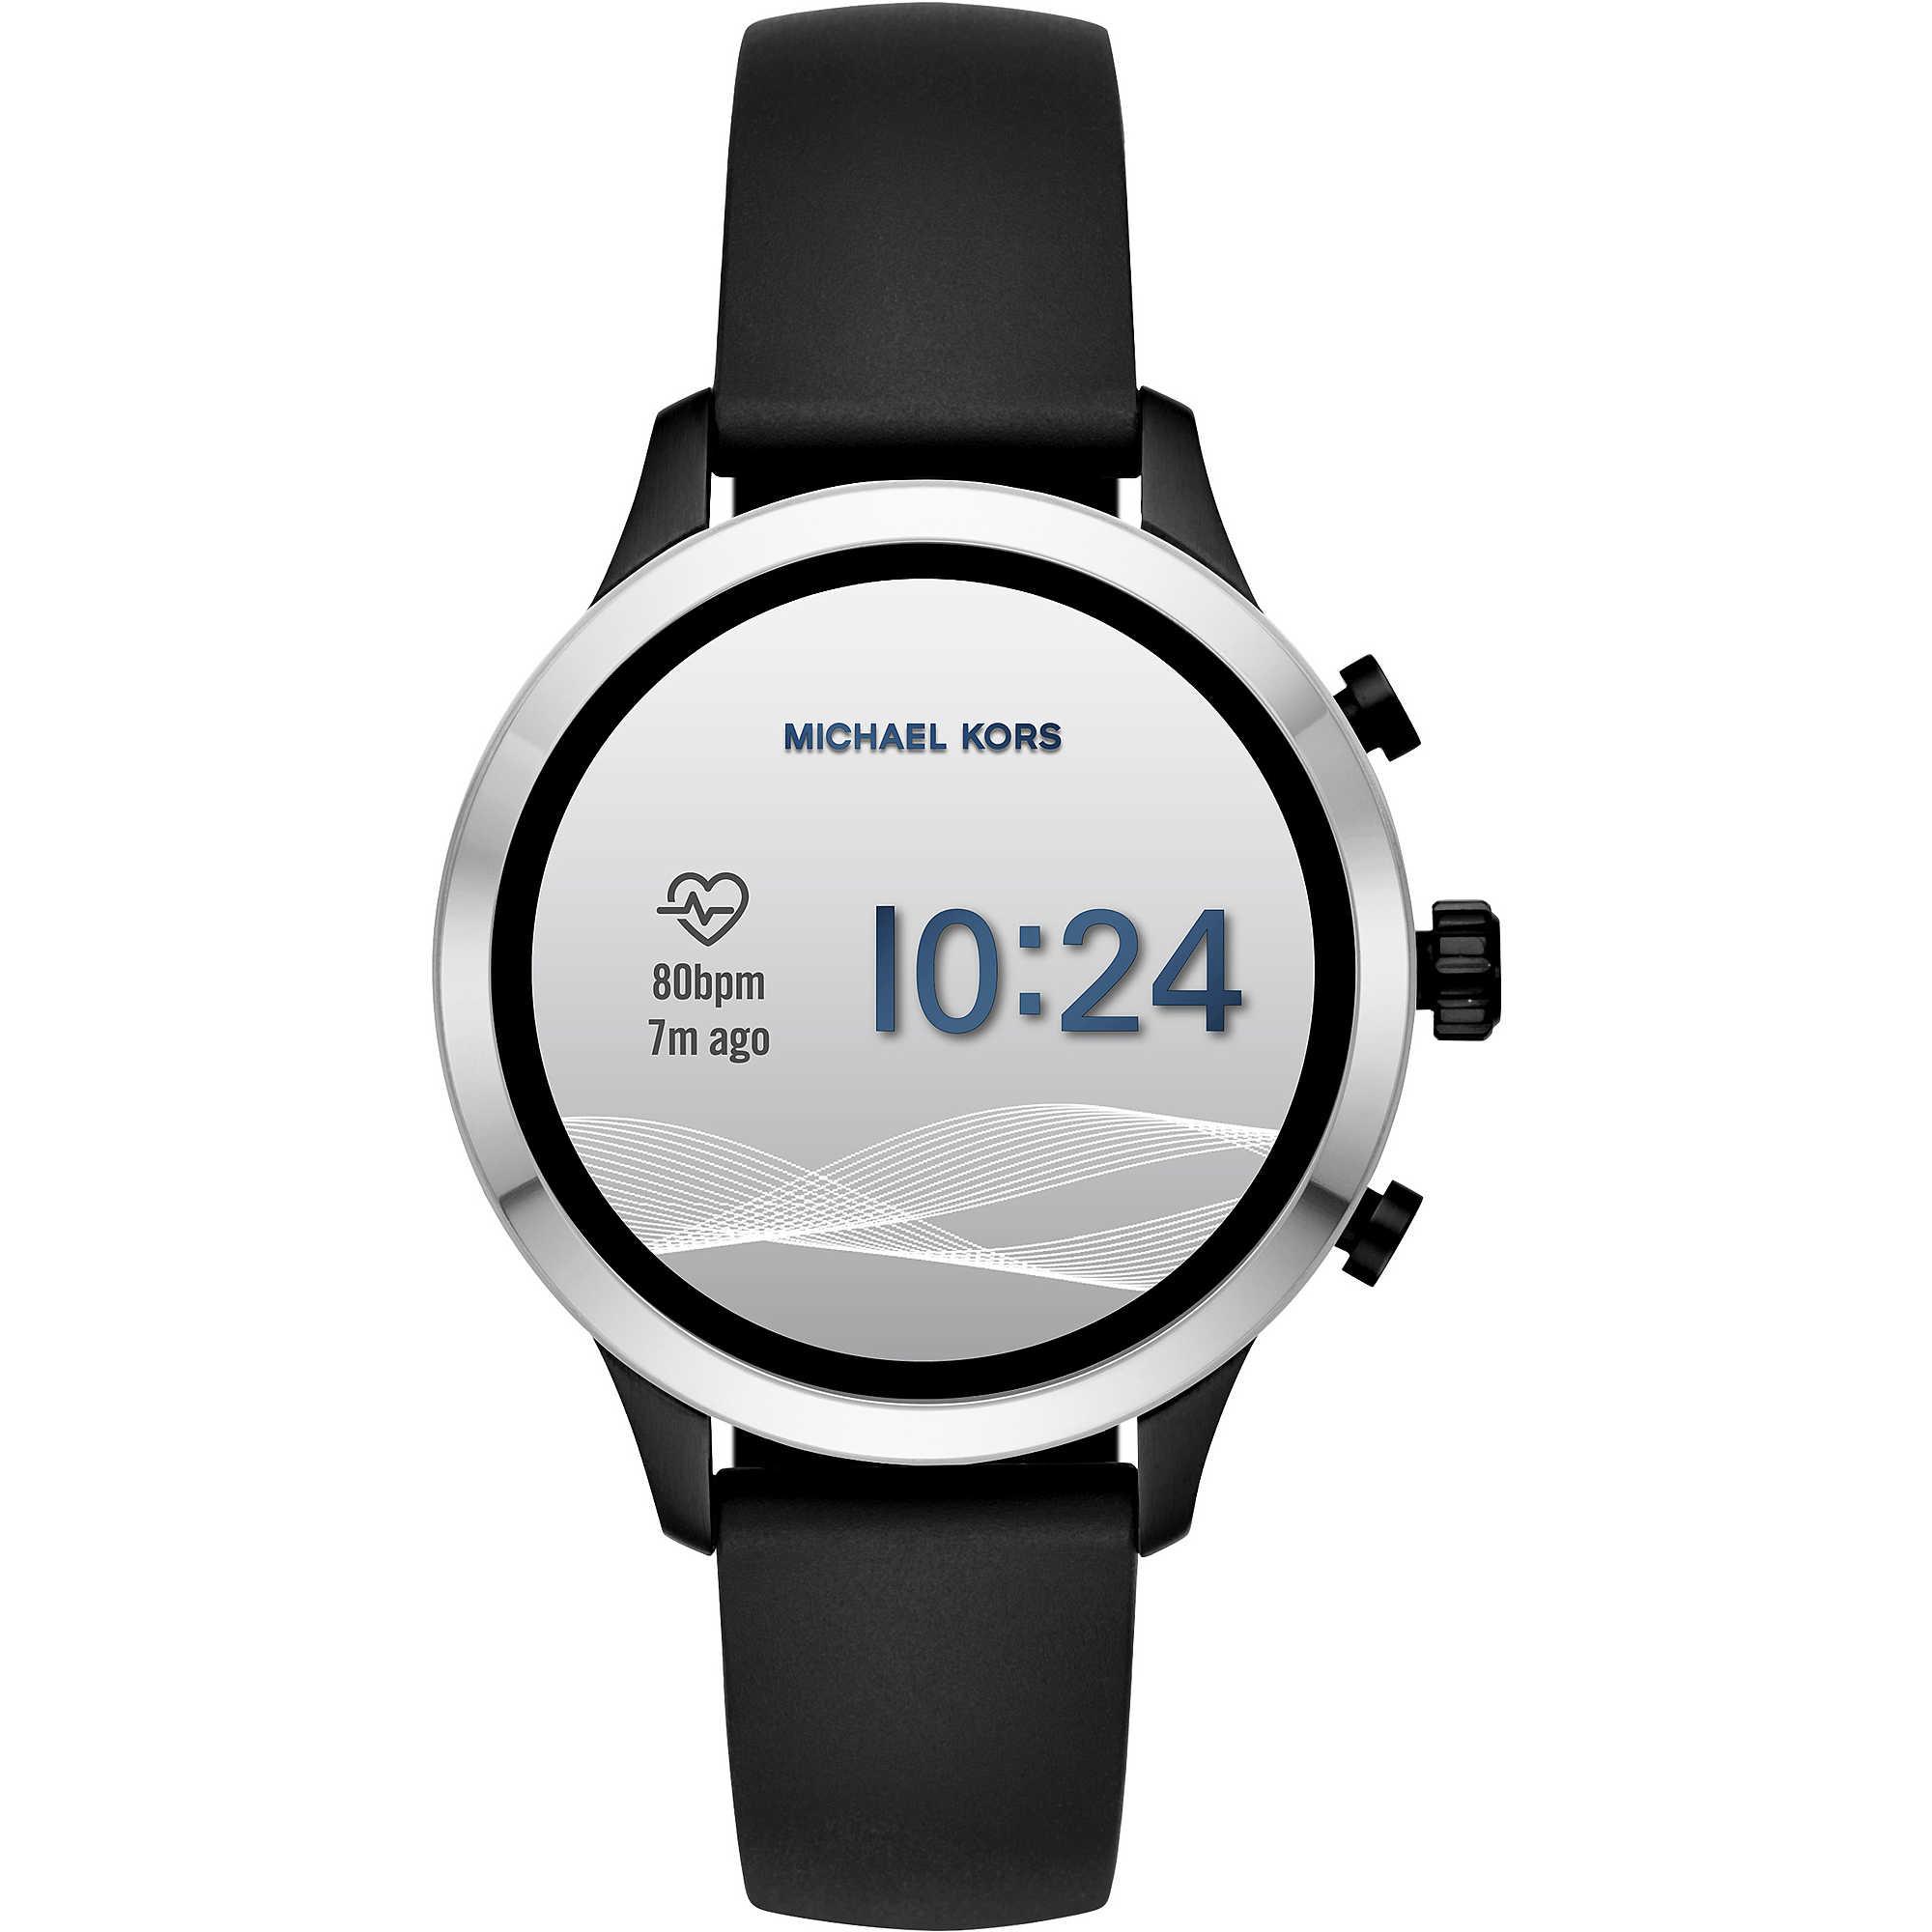 5ac41f5269 orologio Smartwatch donna Michael Kors Runway MKT5049 Smartwatches ...